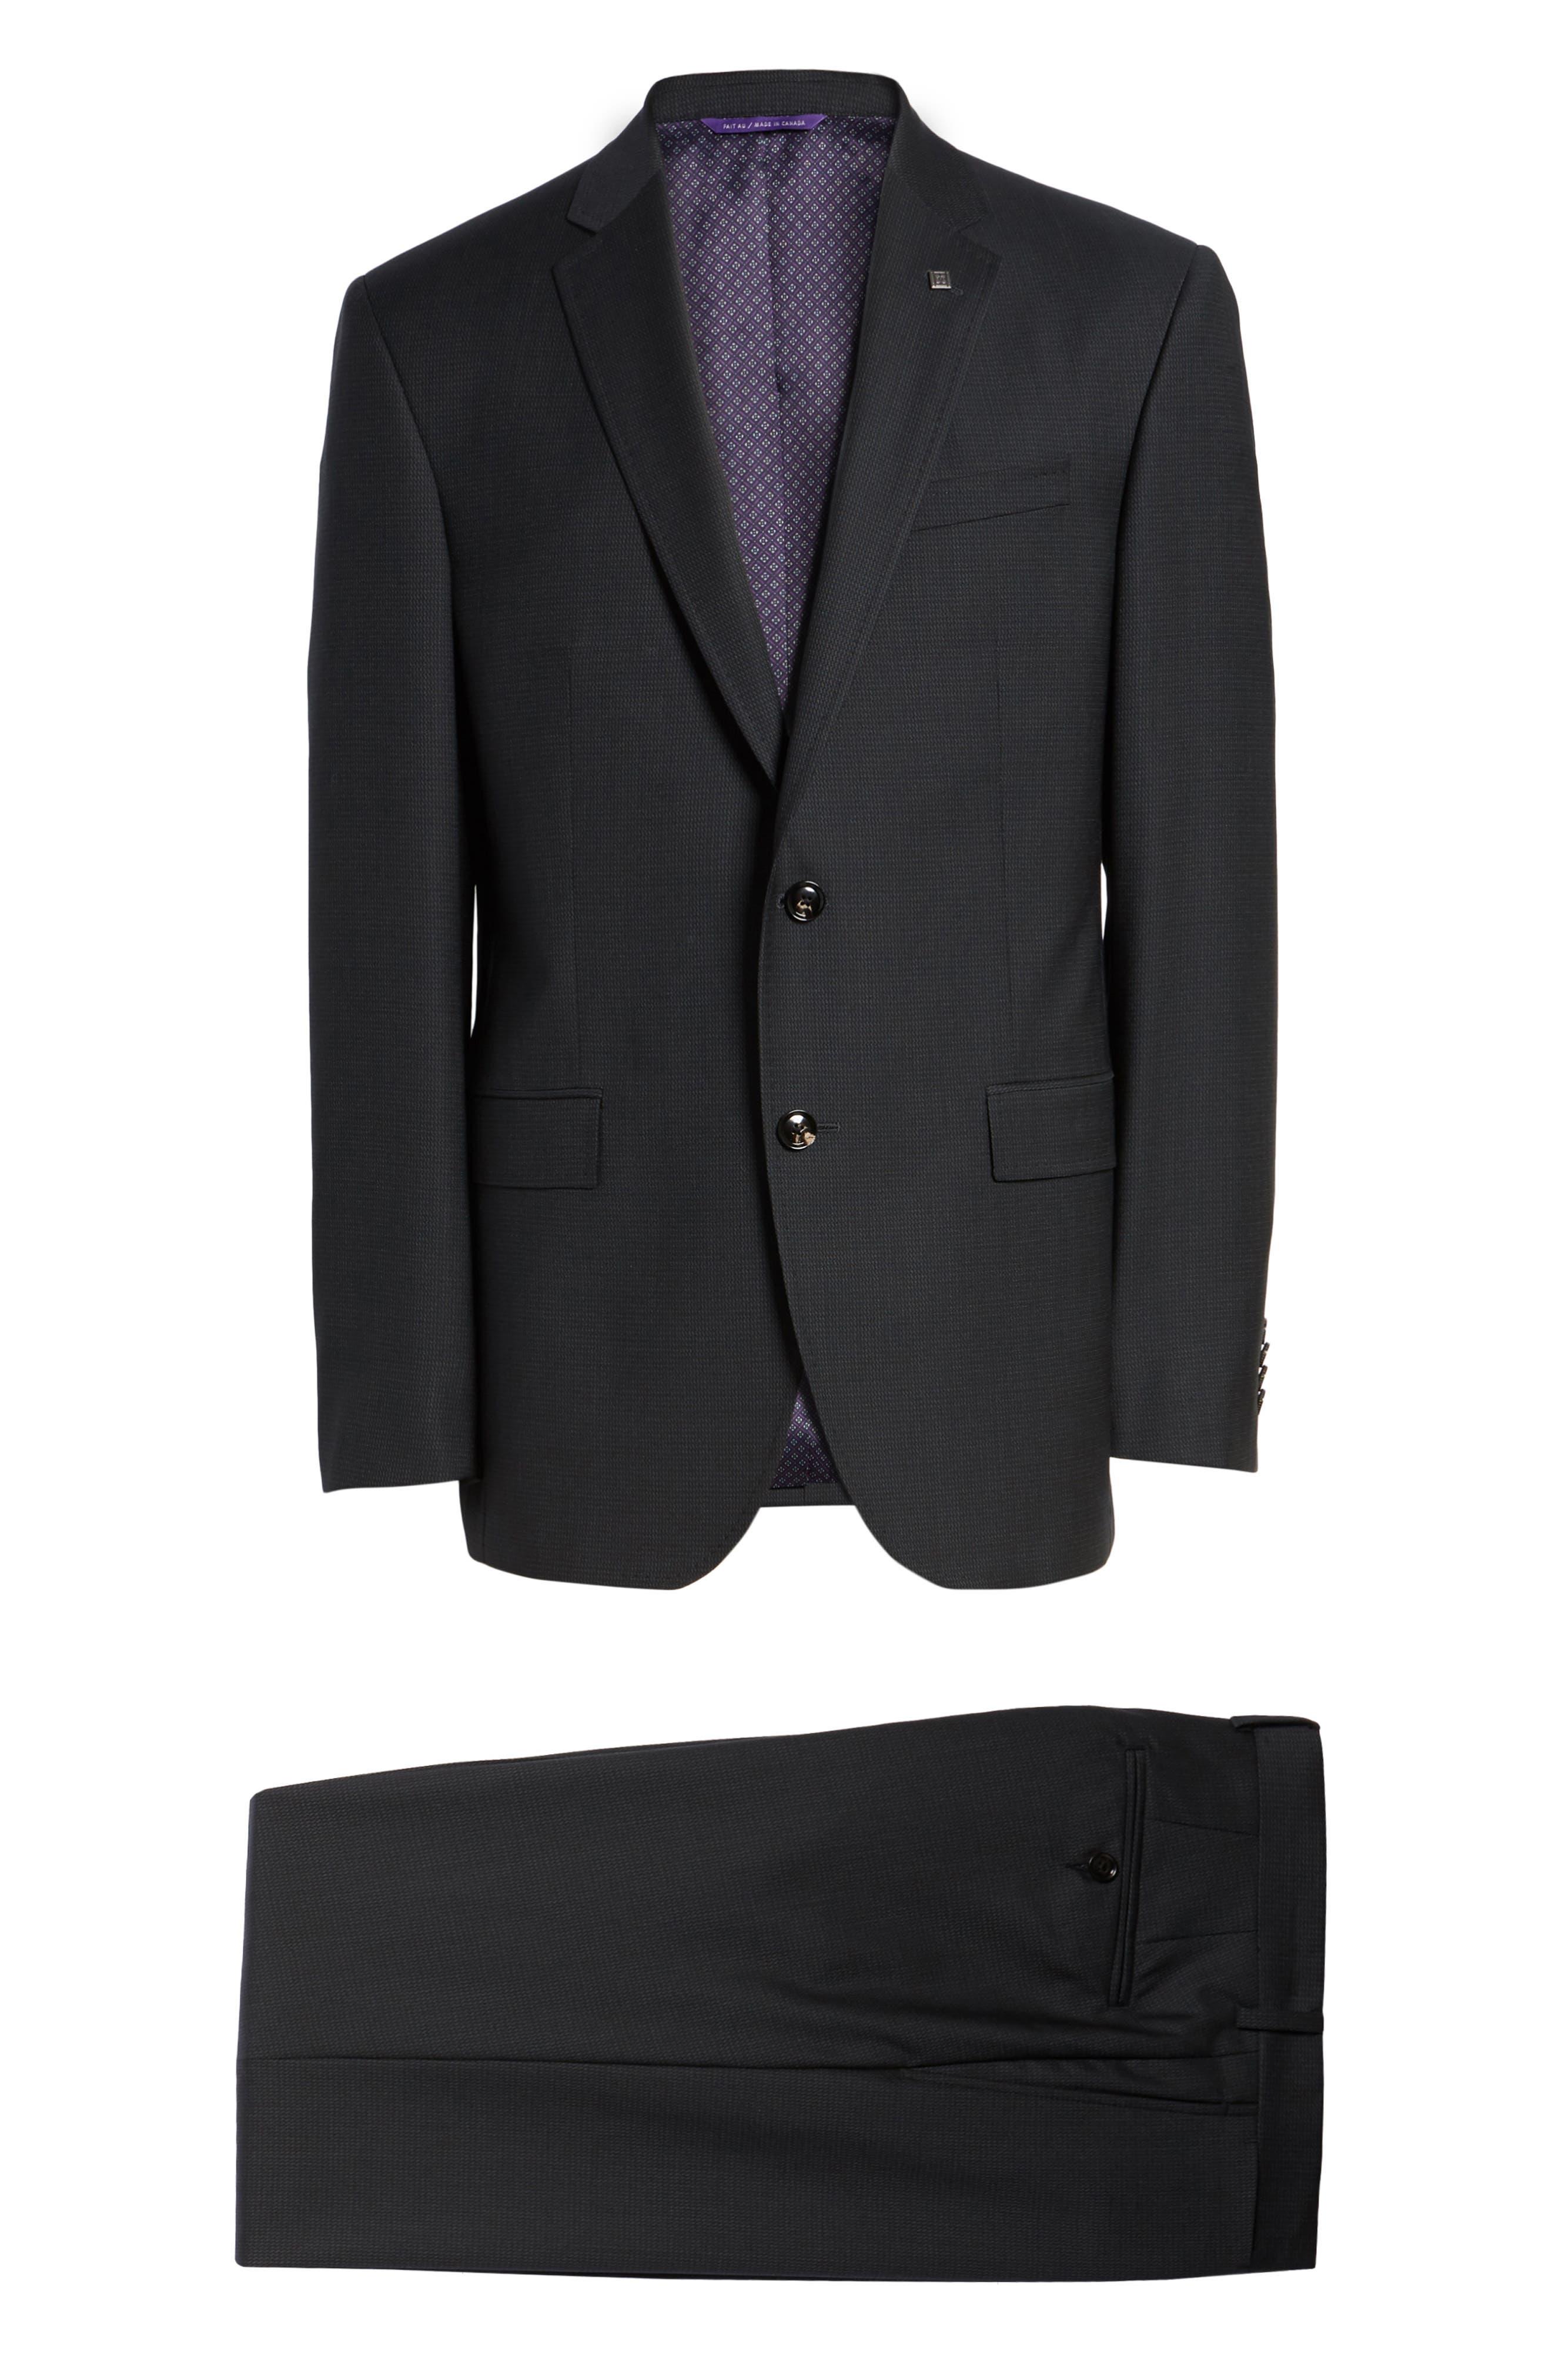 Jay Trim Fit Solid Wool Suit,                             Alternate thumbnail 8, color,                             001